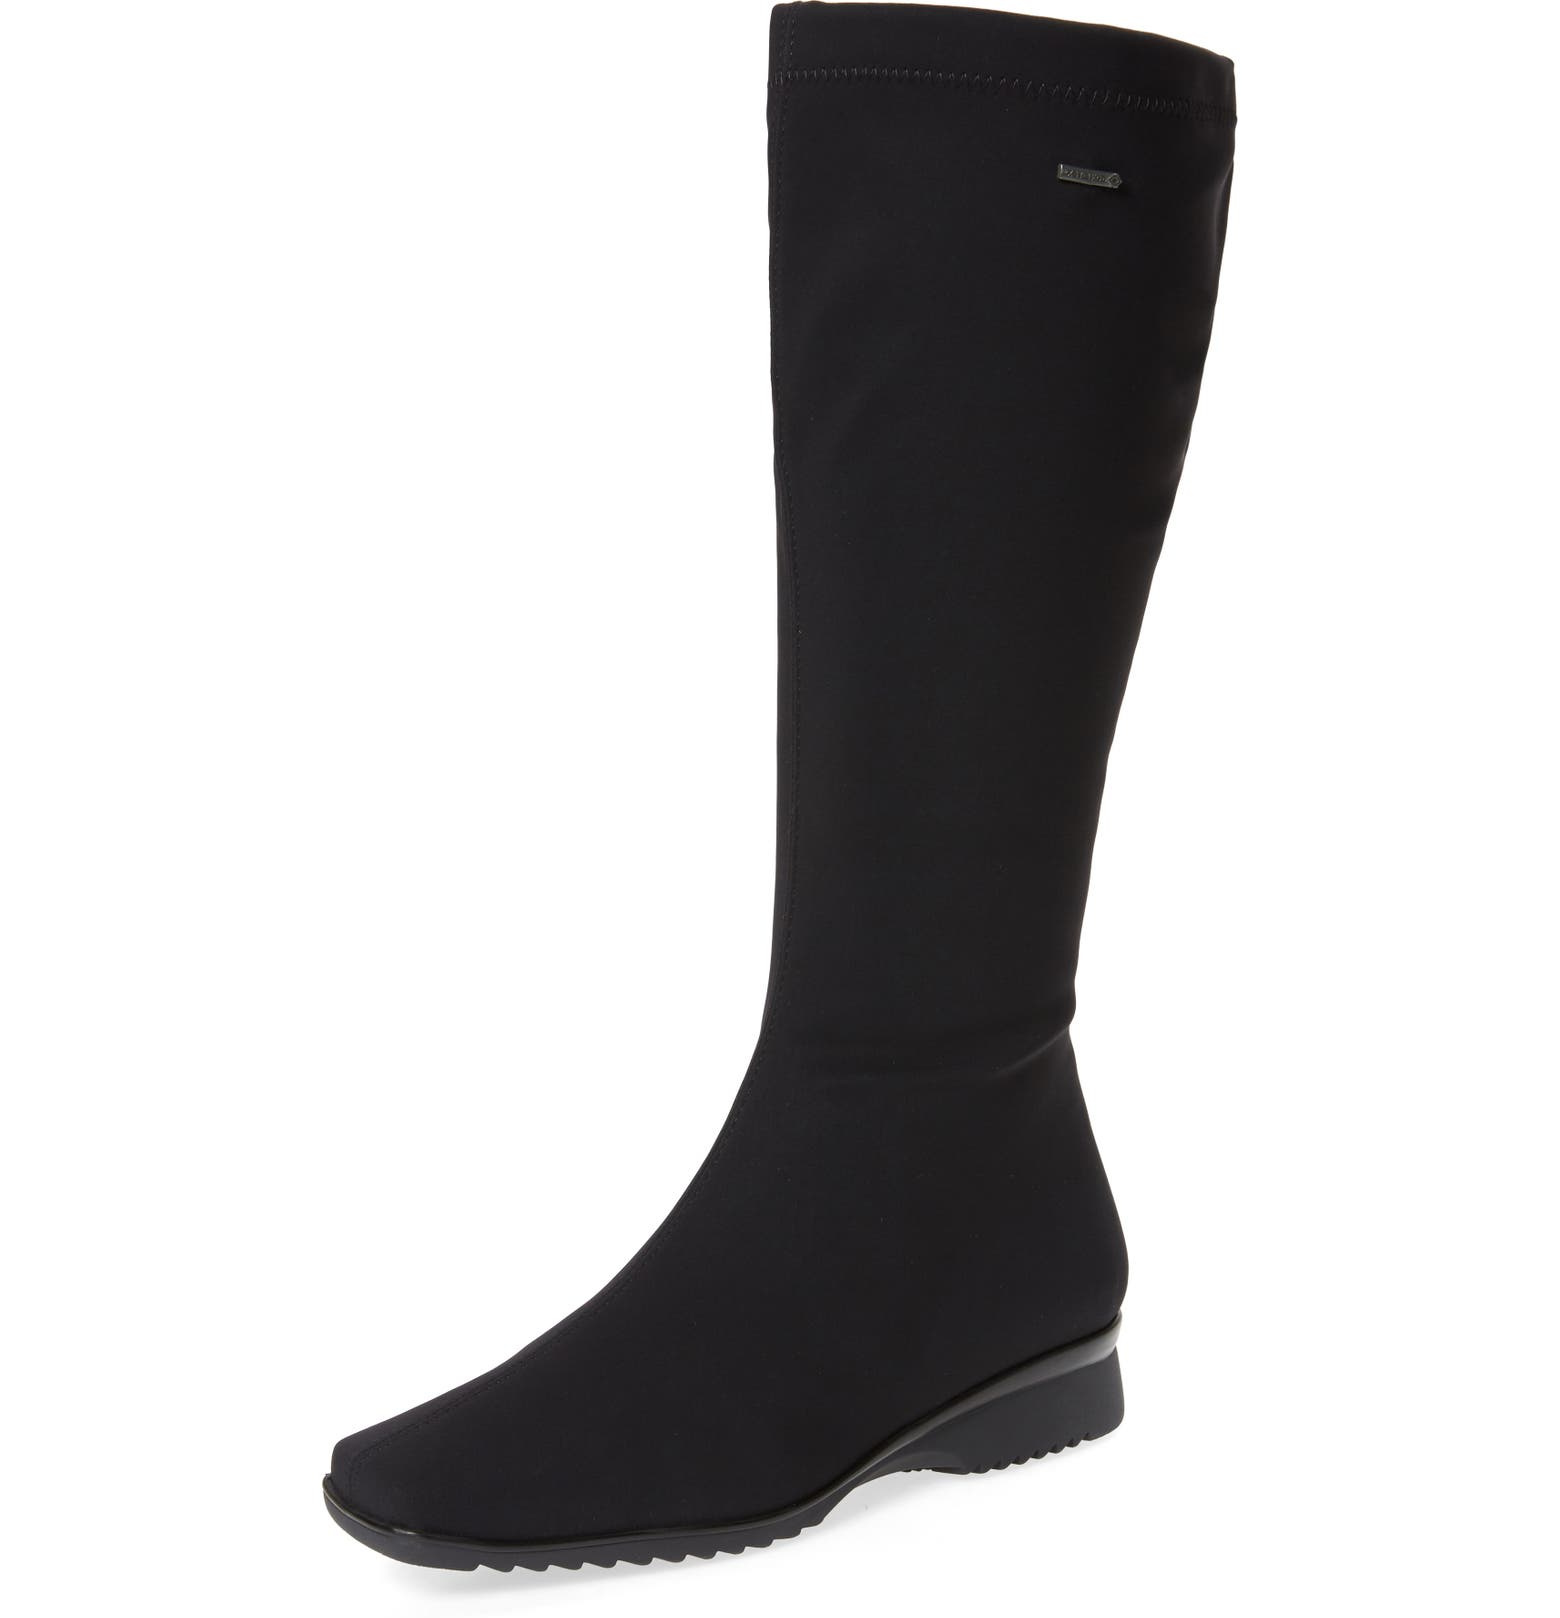 rockport-kneehigh-boots-for-women